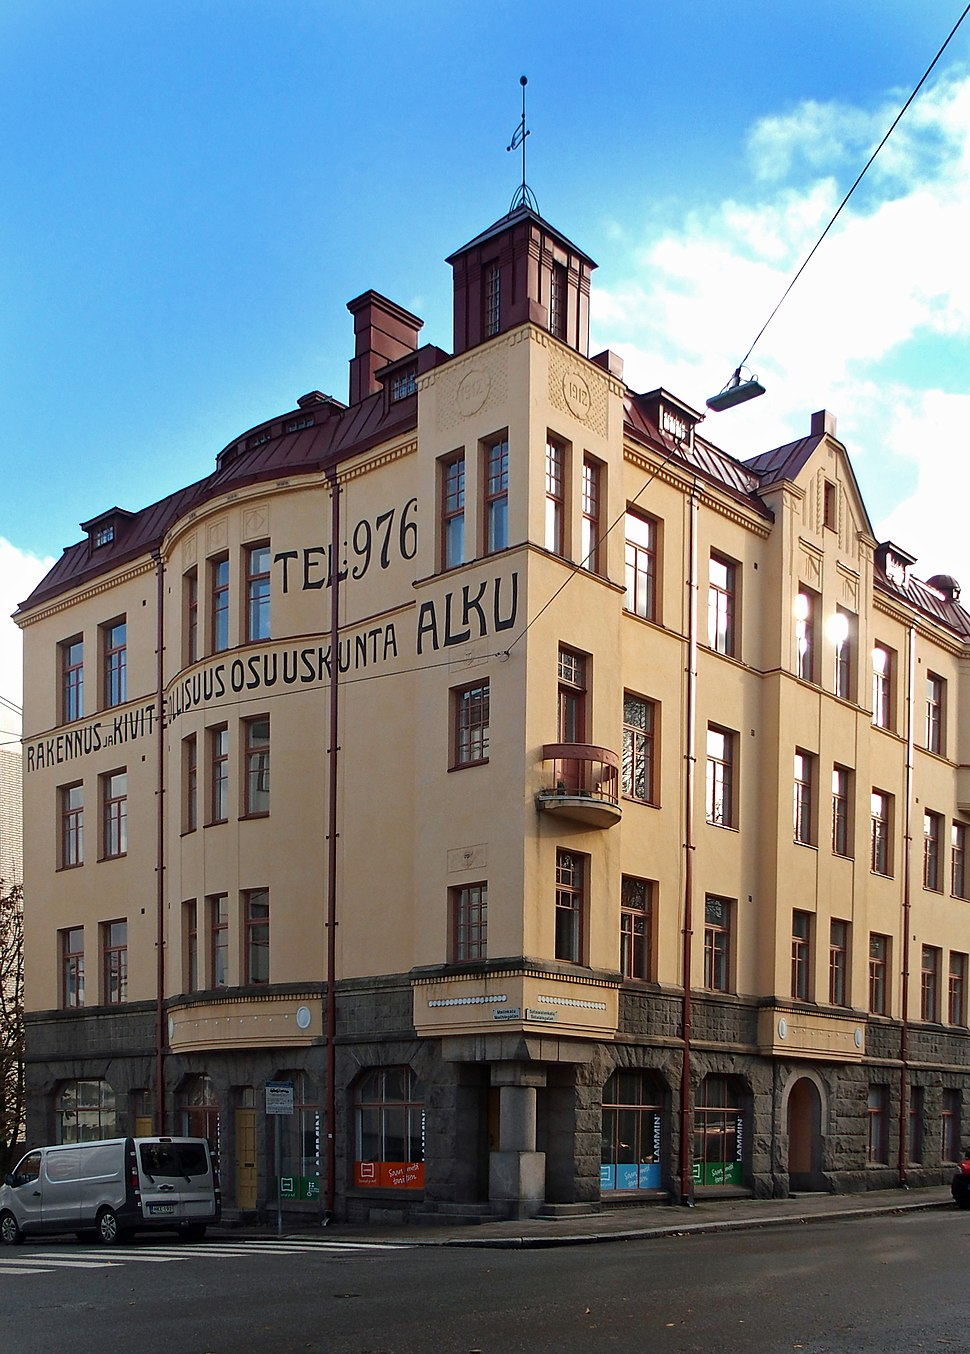 Alku building in Martti, Turku